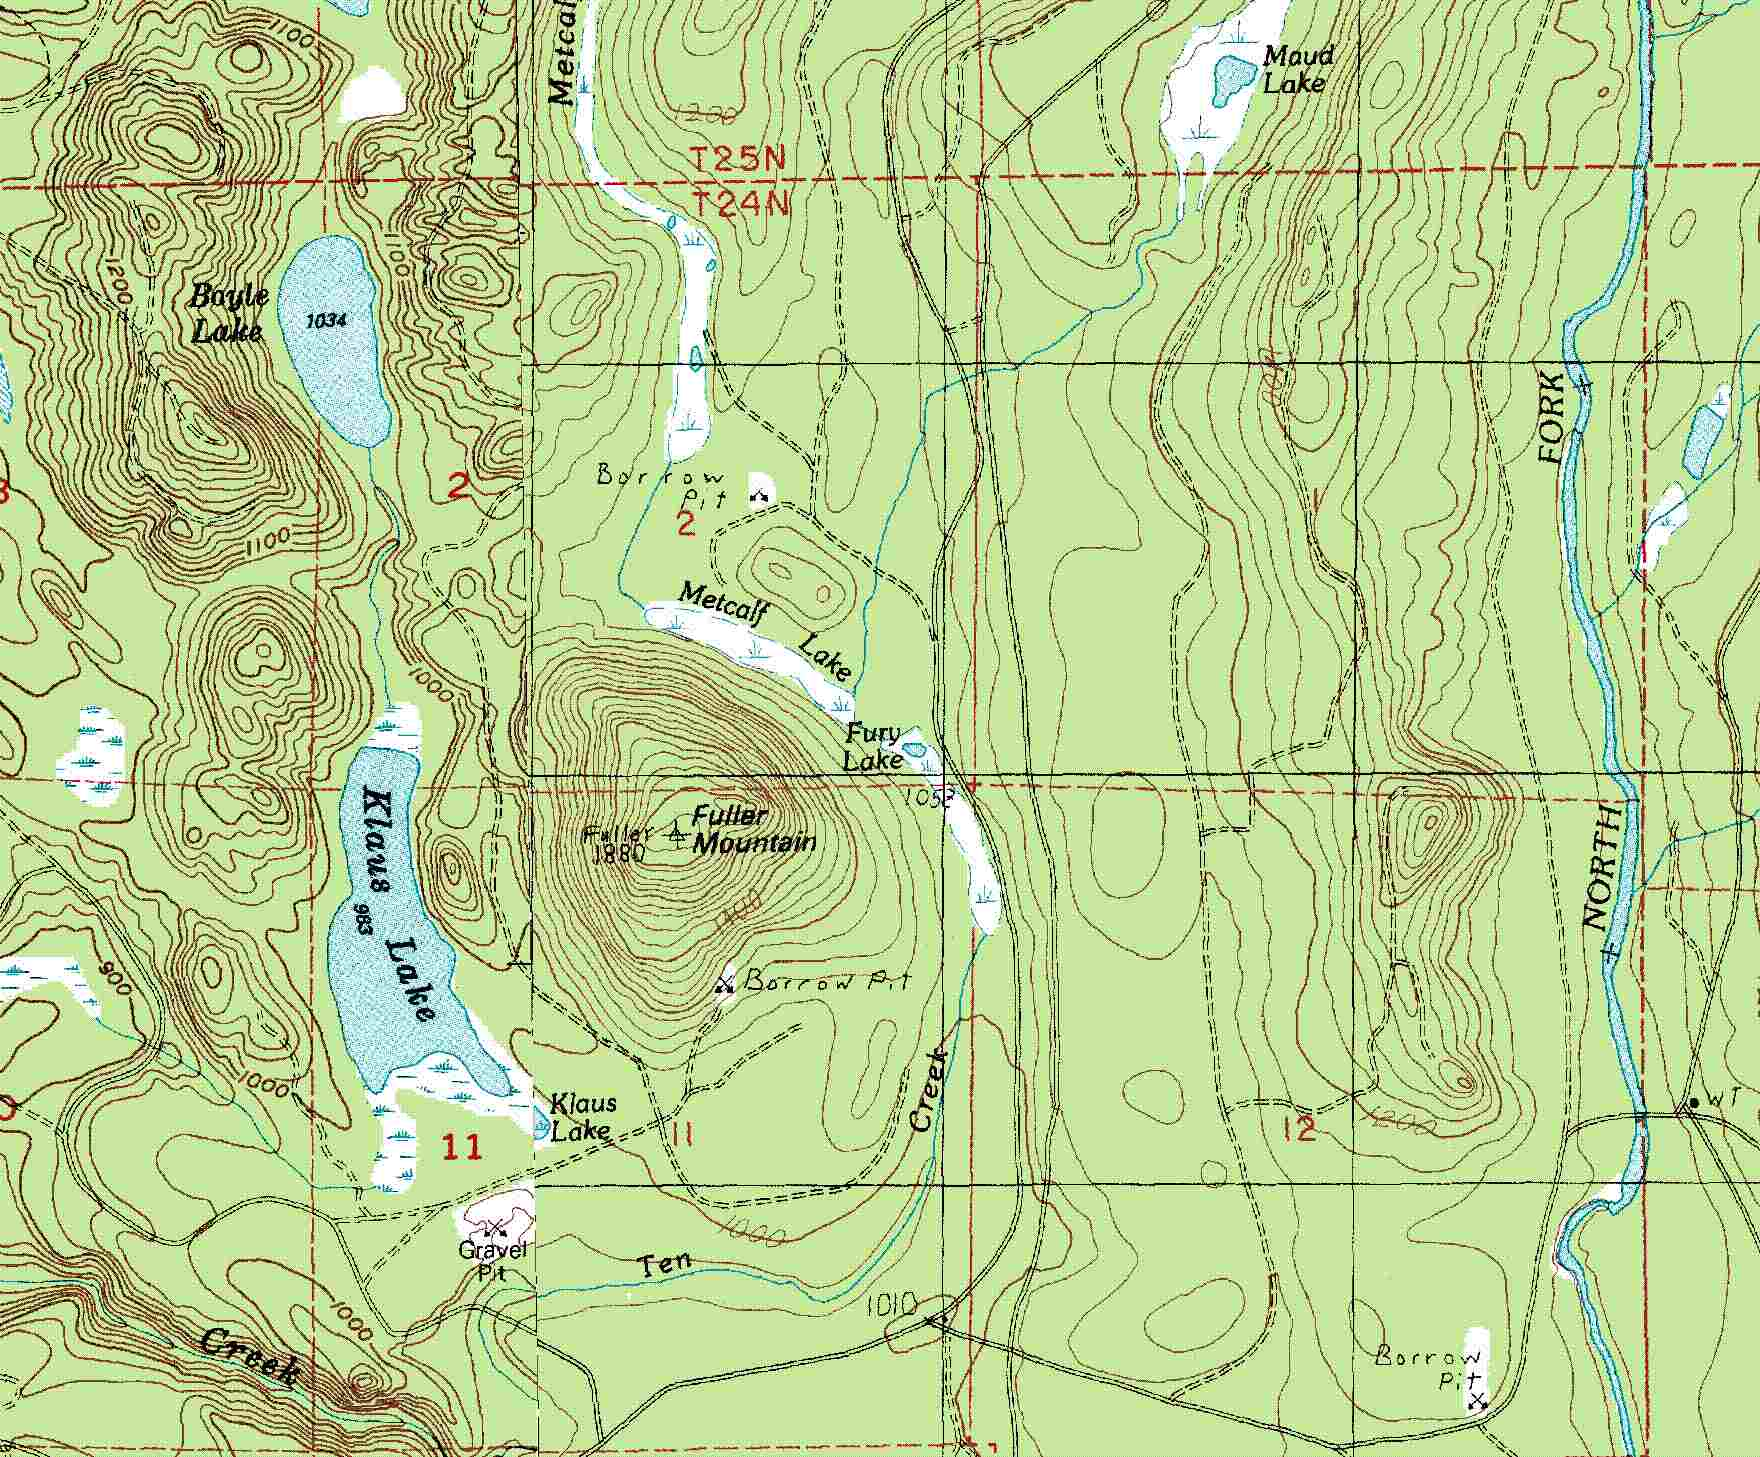 Fuller Mountain Topo Map Fuller Mountain Washington Mappery - Topo maps online